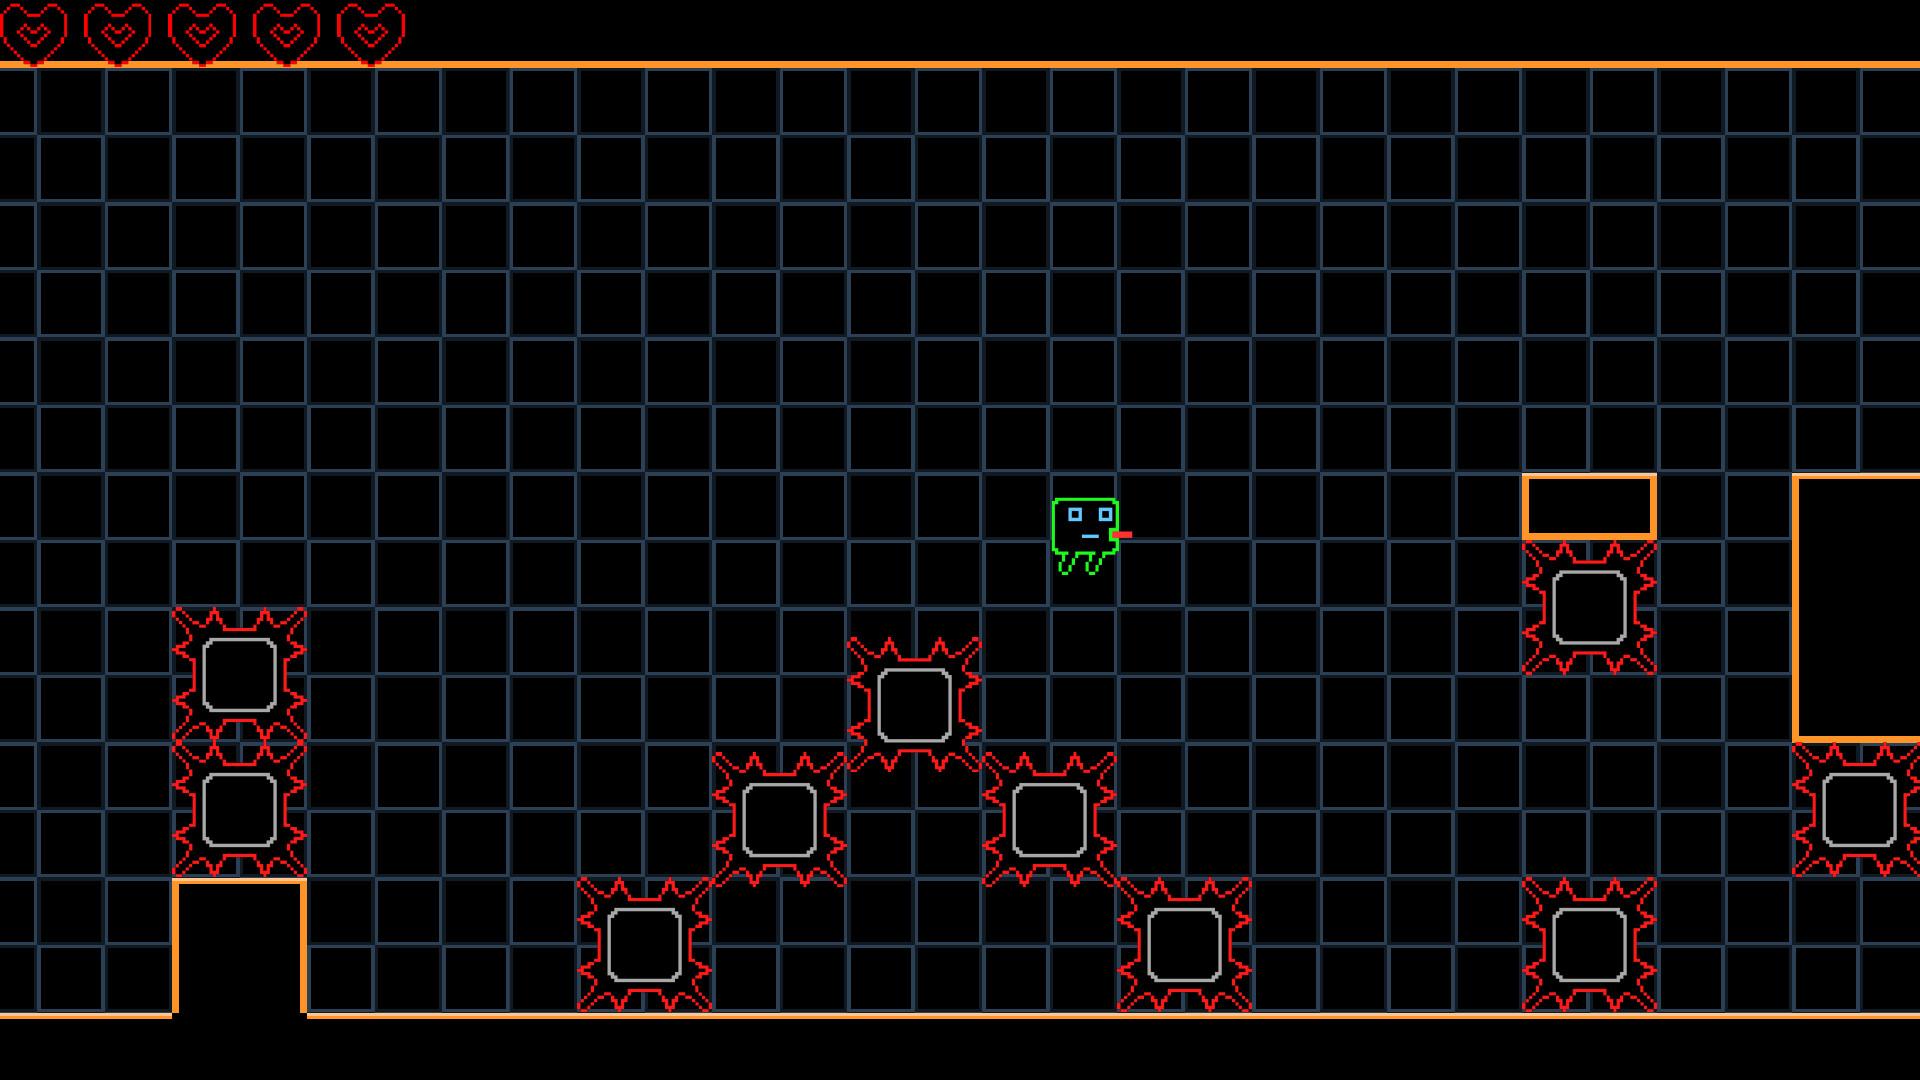 Dungeon of Zolthan screenshot